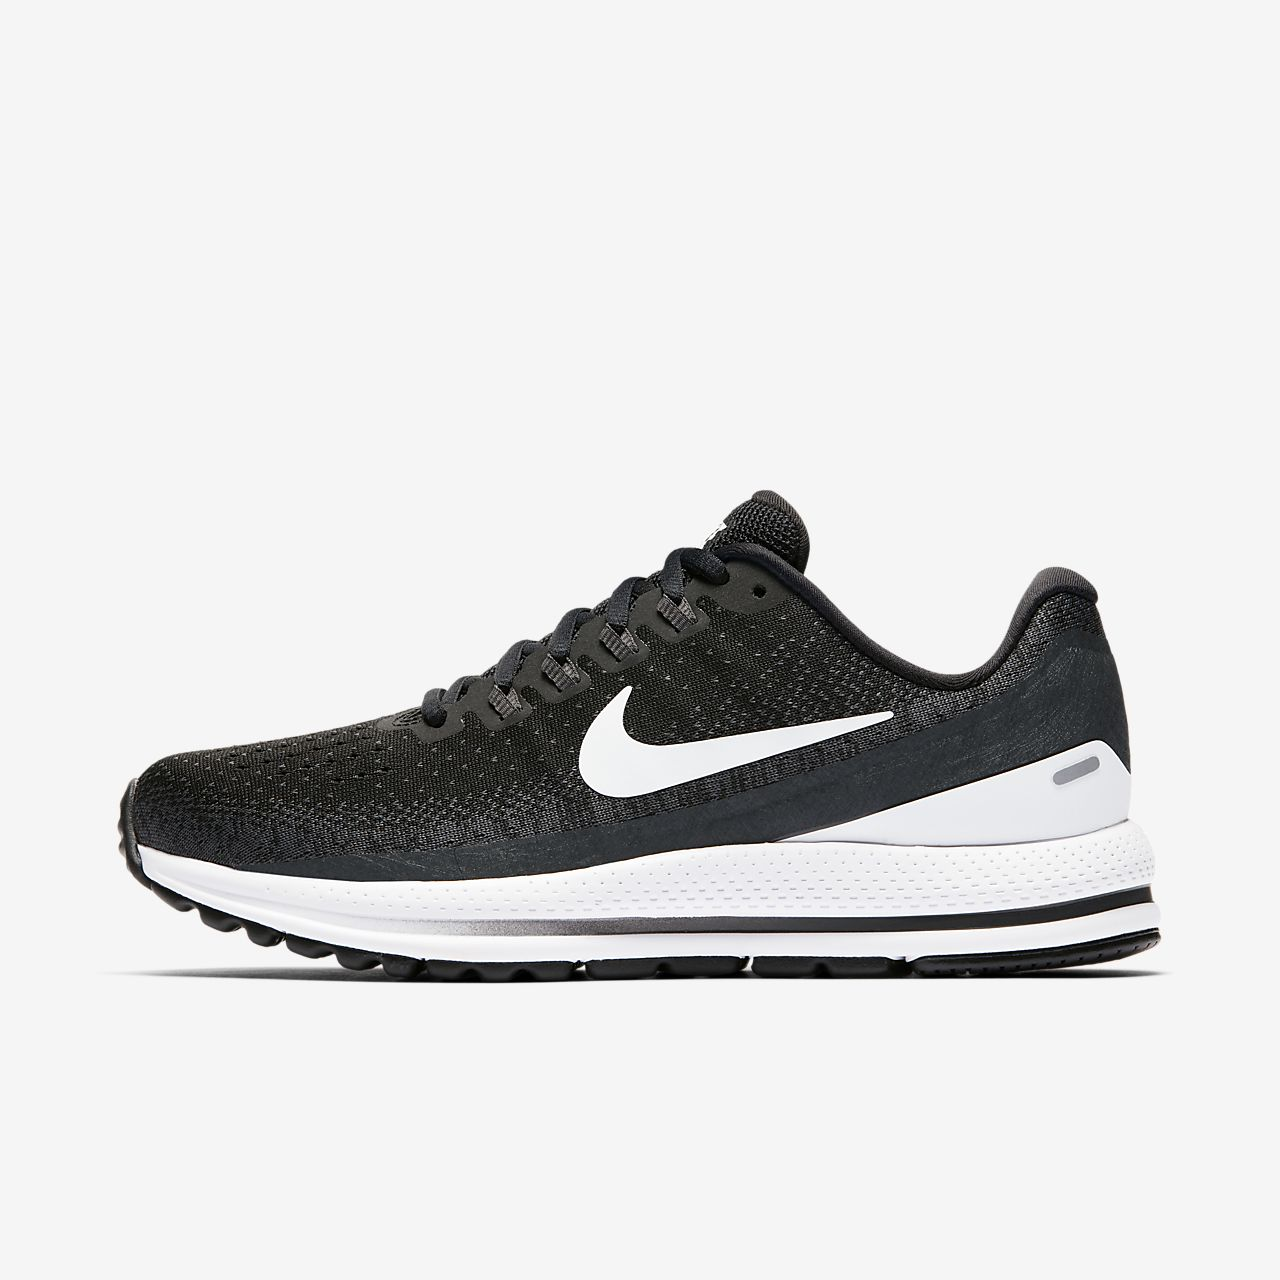 ... Scarpa da running Nike Air Zoom Vomero 13 - Donna